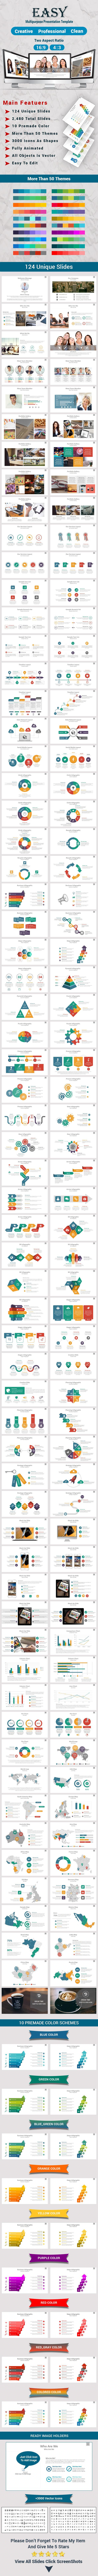 Easy Multipurpose PowerPoint Presentation Template